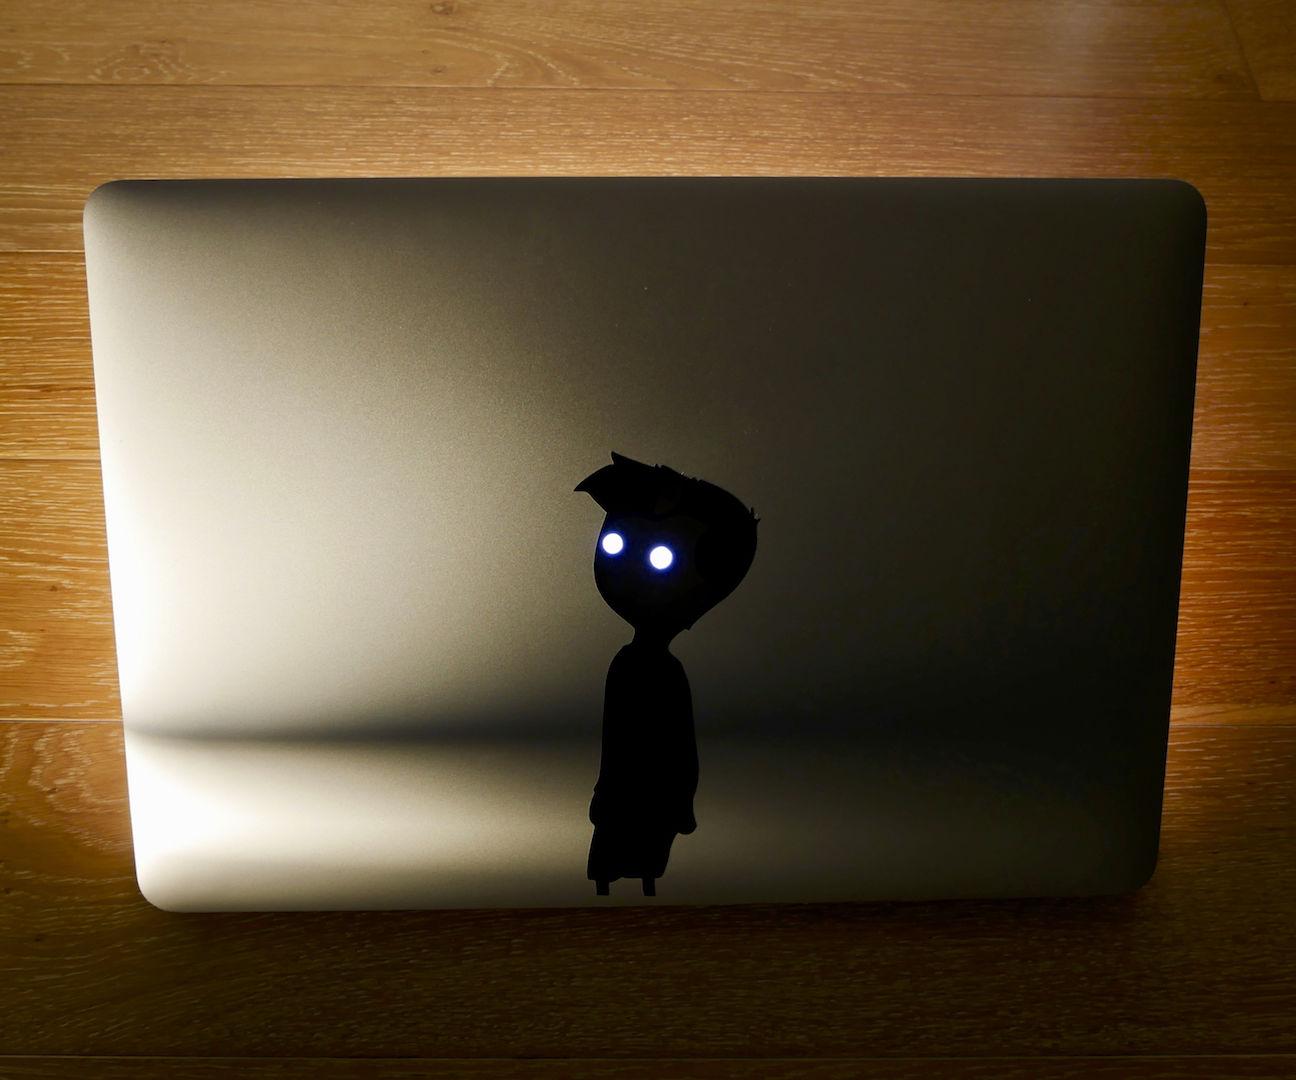 Vinyl Cutting a Custom Laptop Sticker